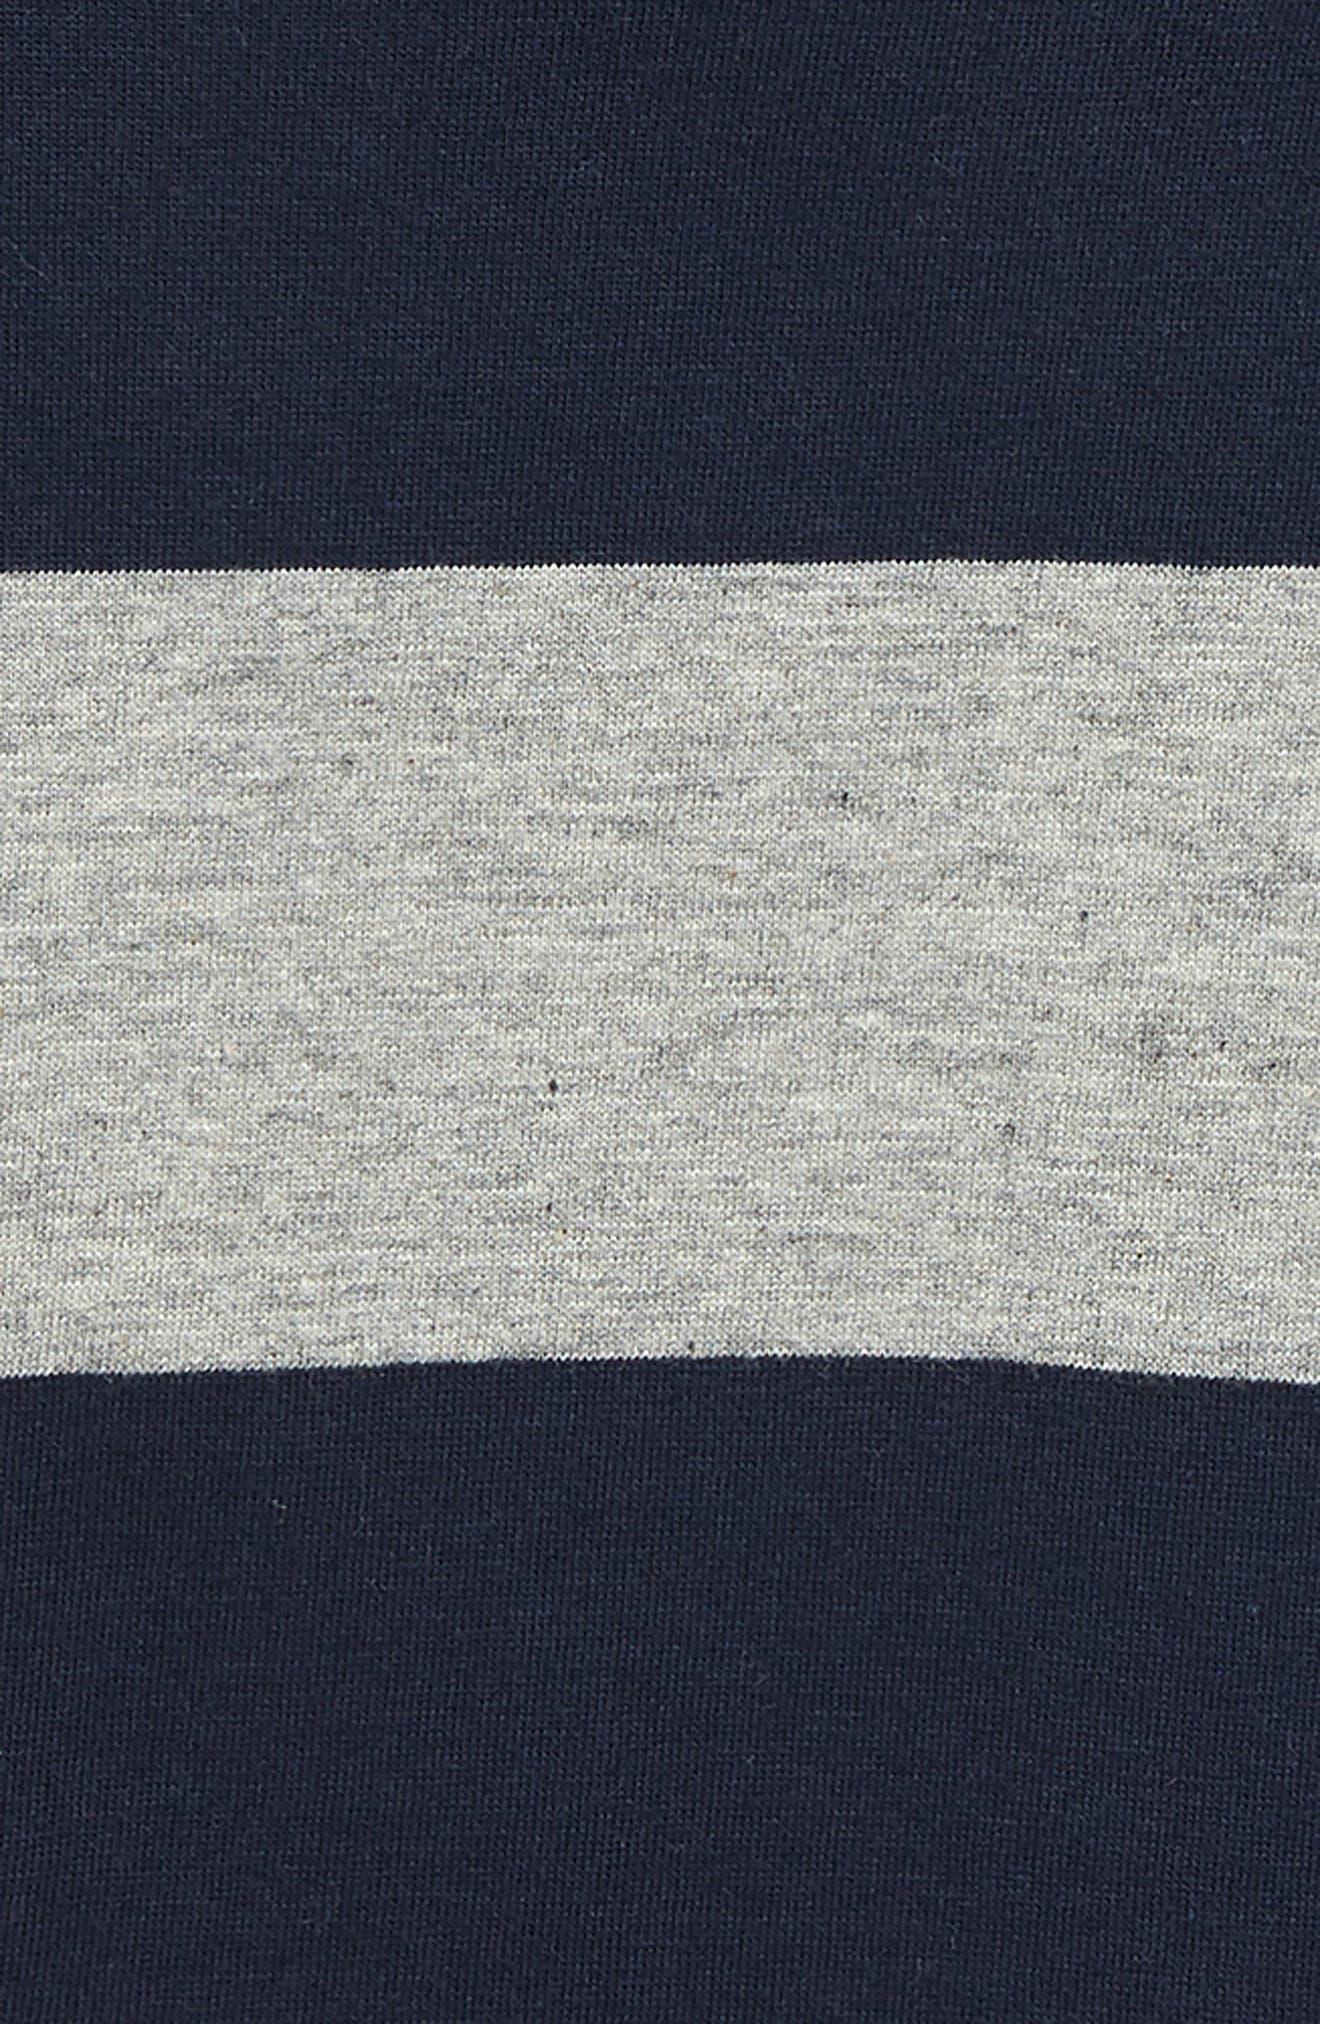 Organic Cotton T-Shirt,                             Alternate thumbnail 2, color,                             MIDNIGHT